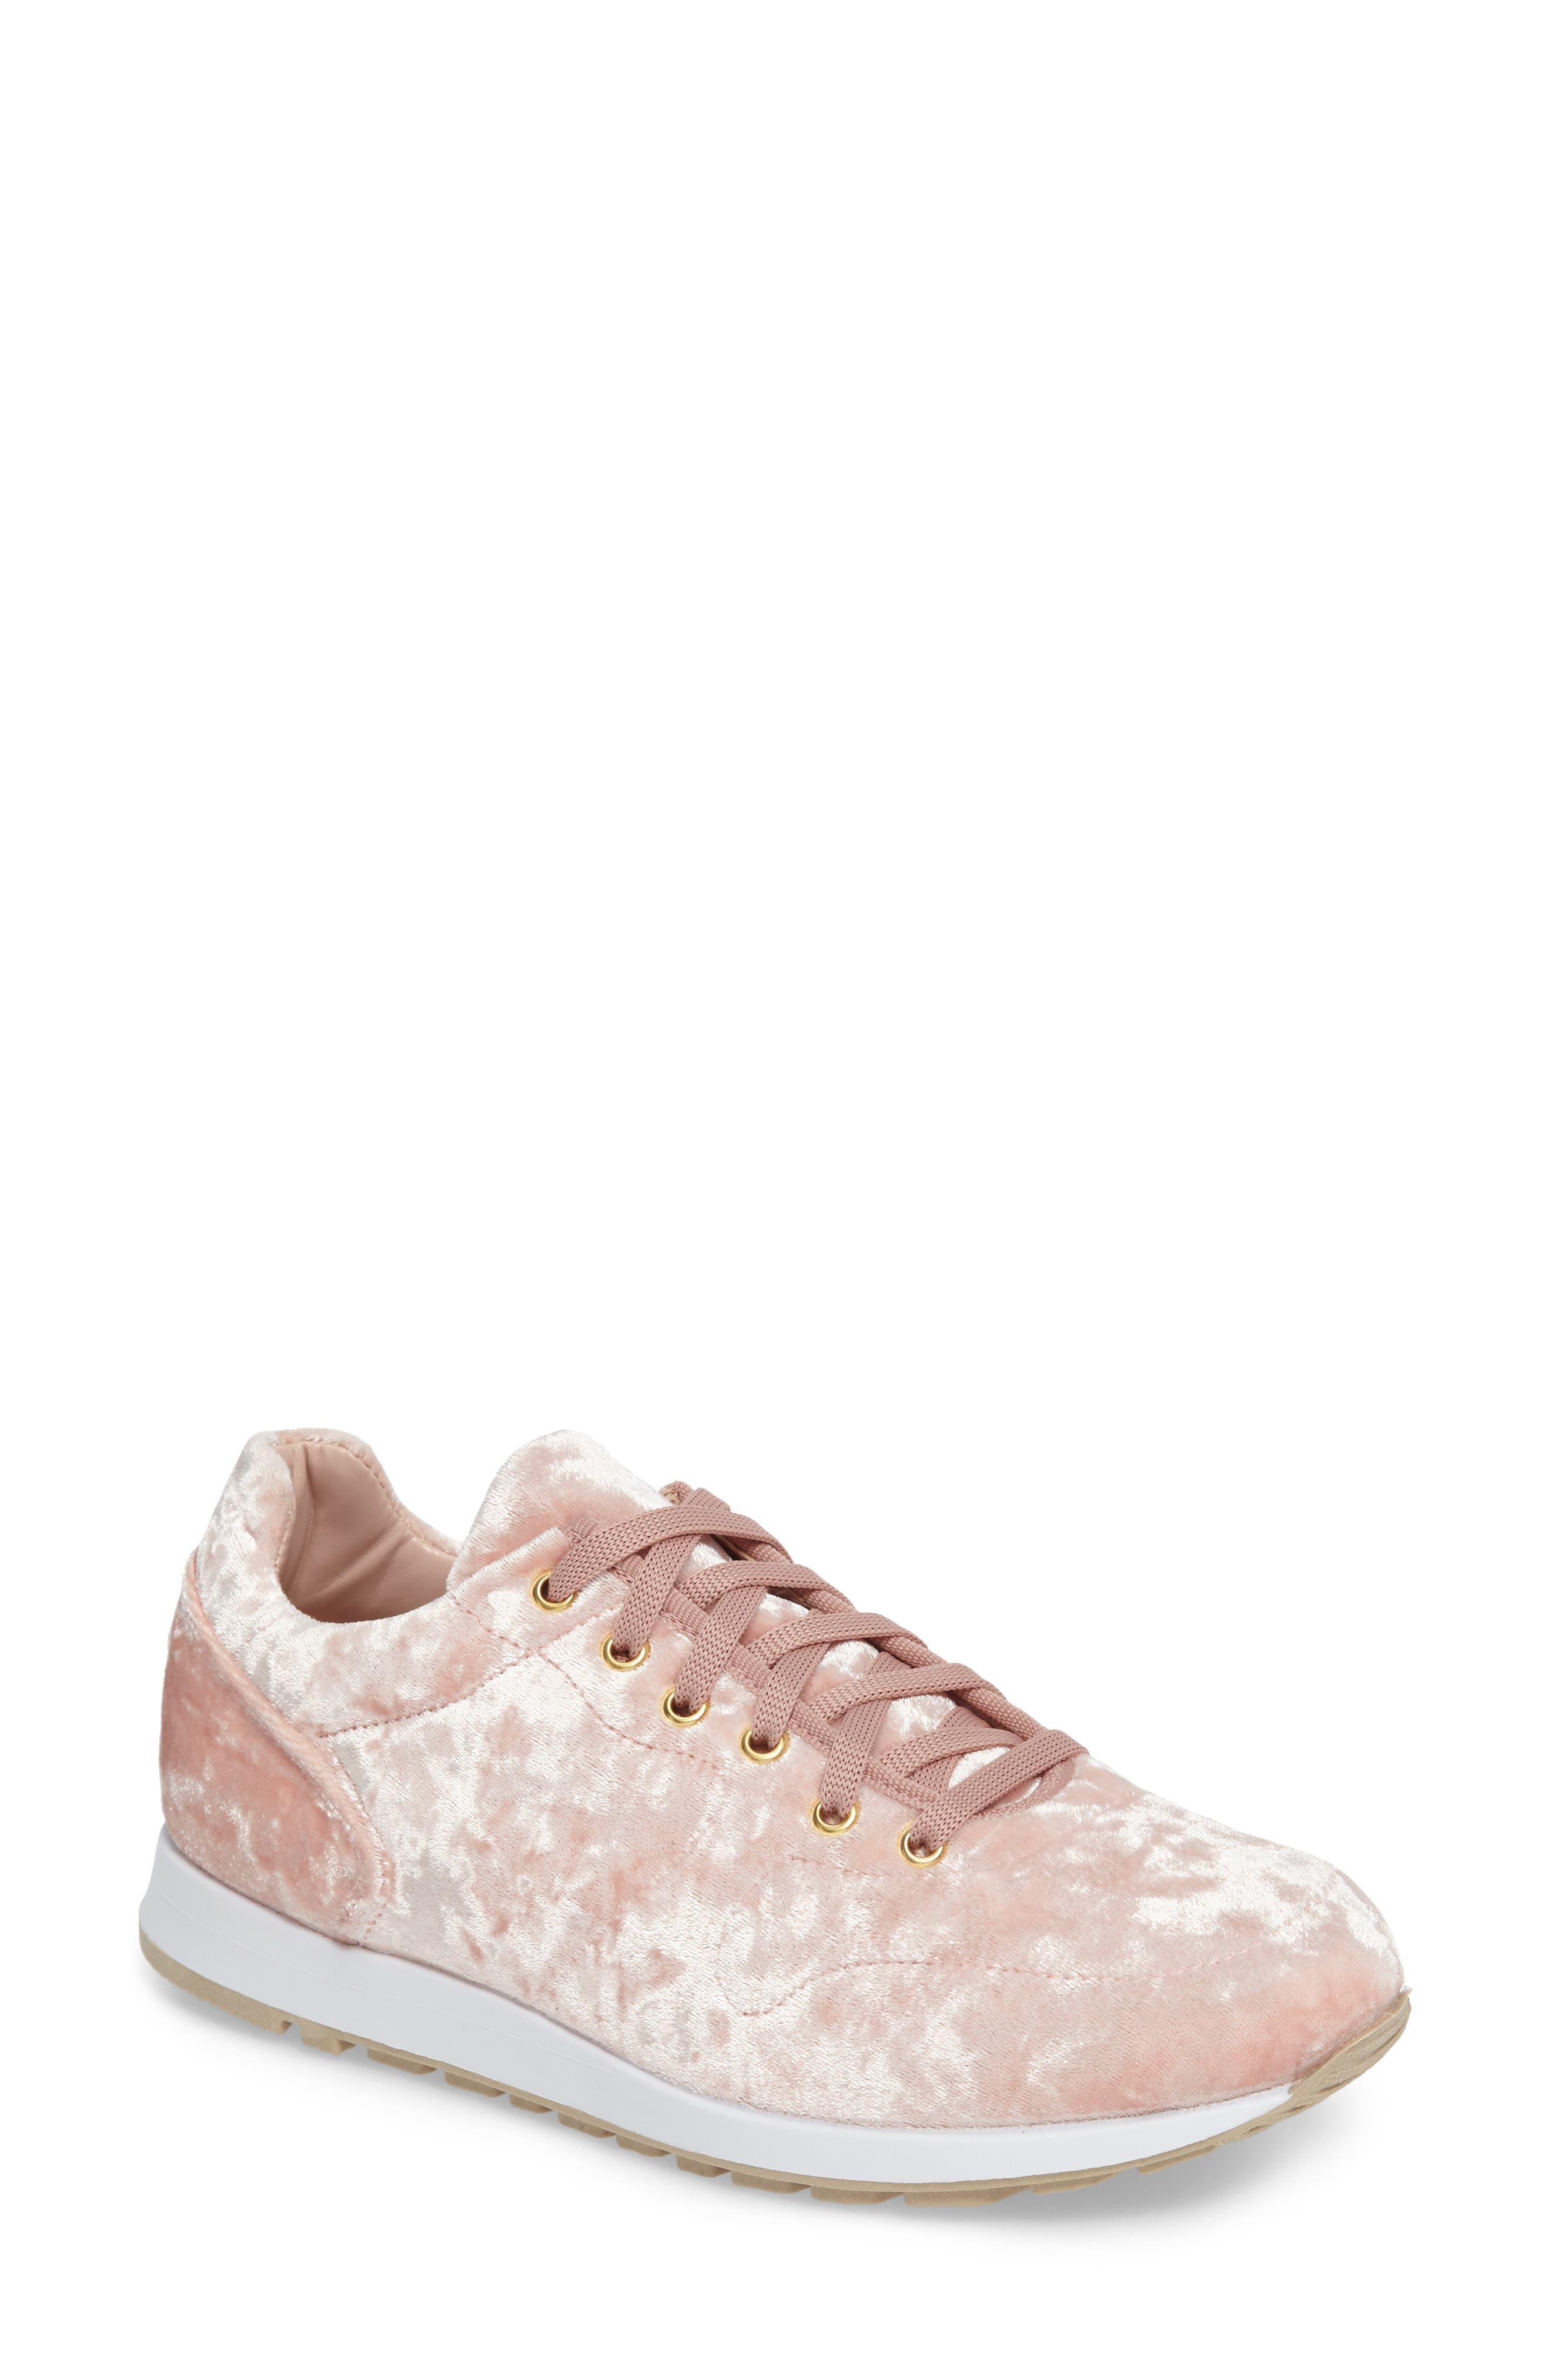 Croatia Velvet Sneaker, Main, color, 650